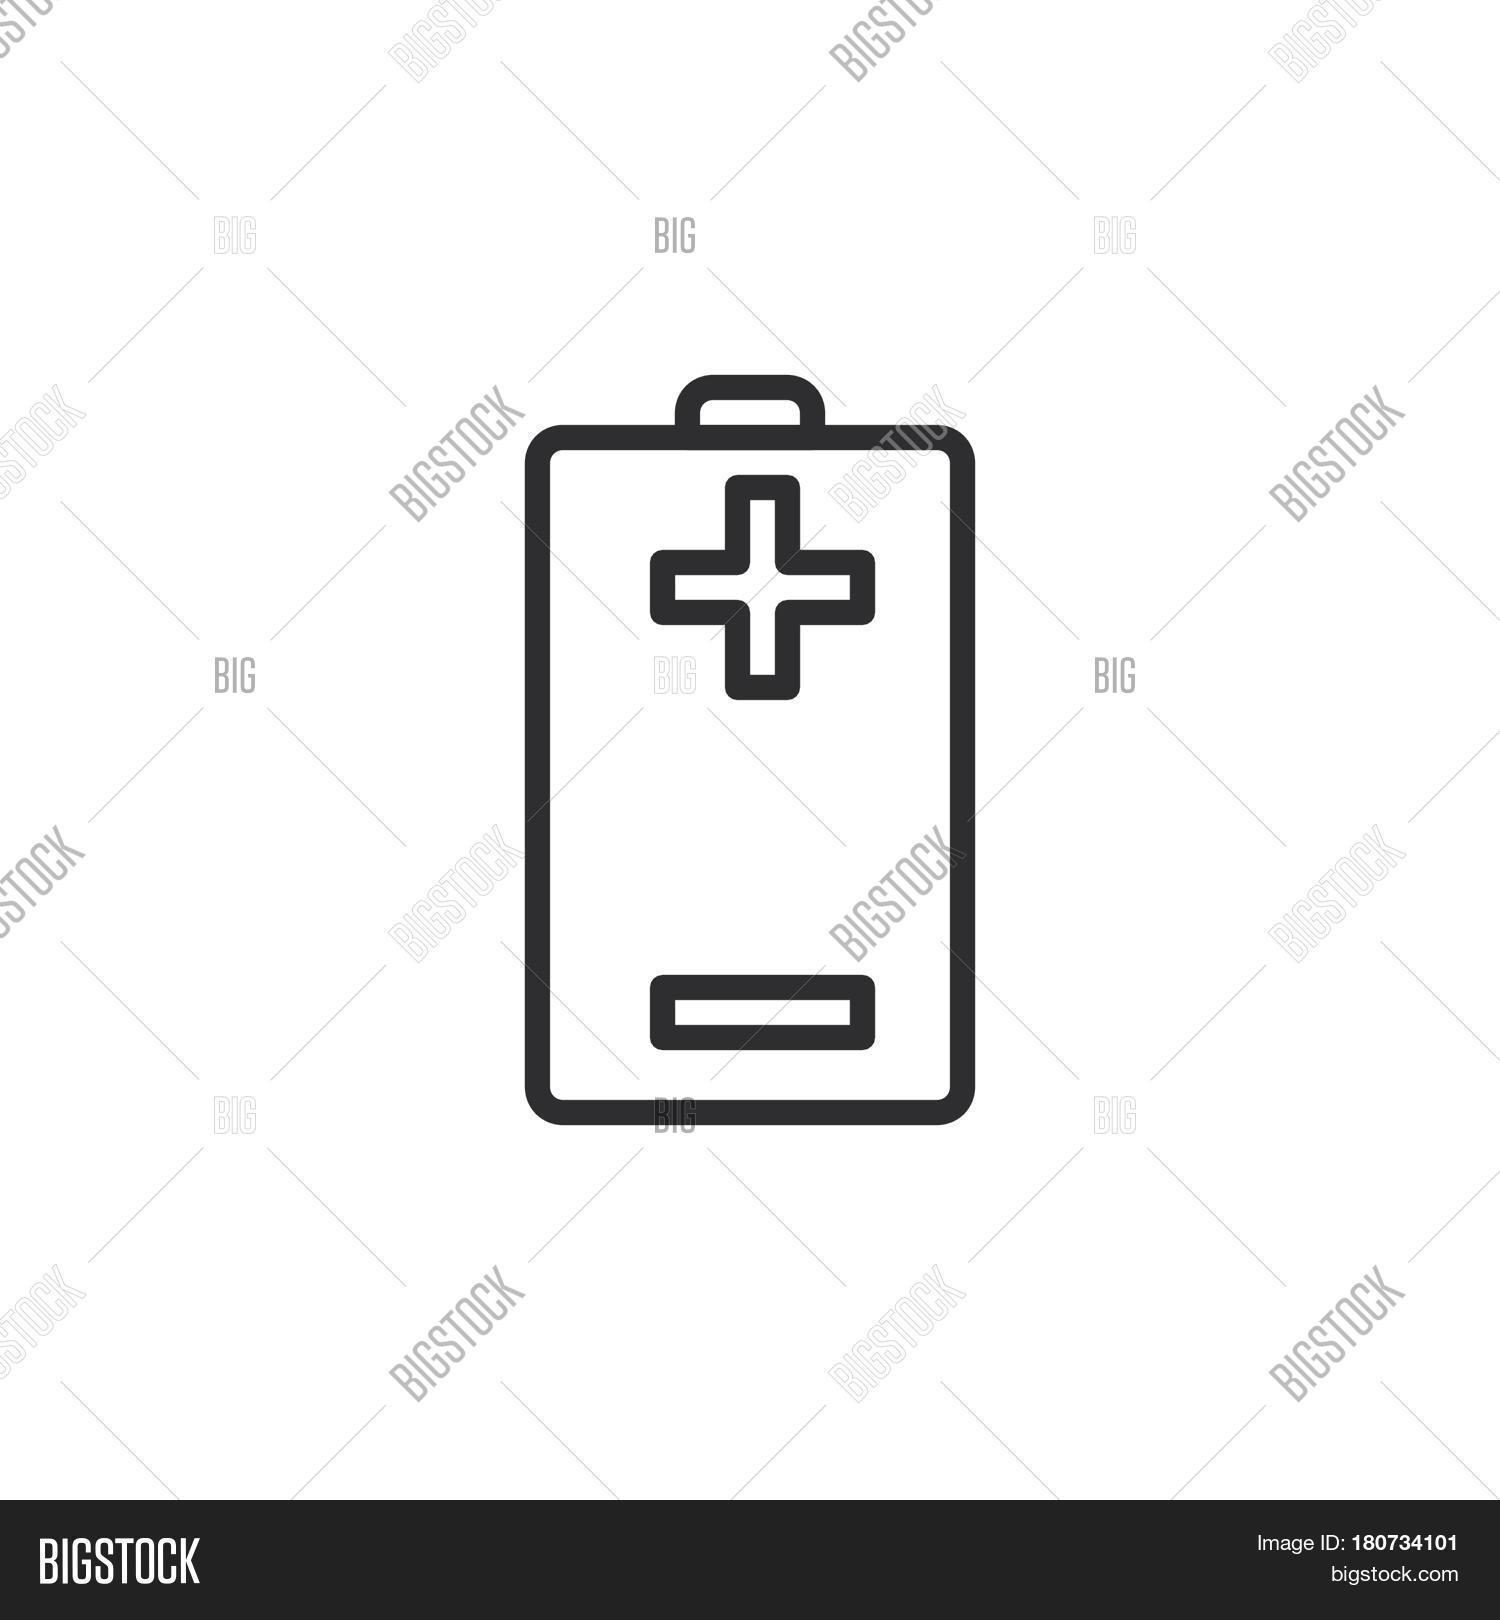 Battery Plus Minus Line Icon Vector & Photo | Bigstock